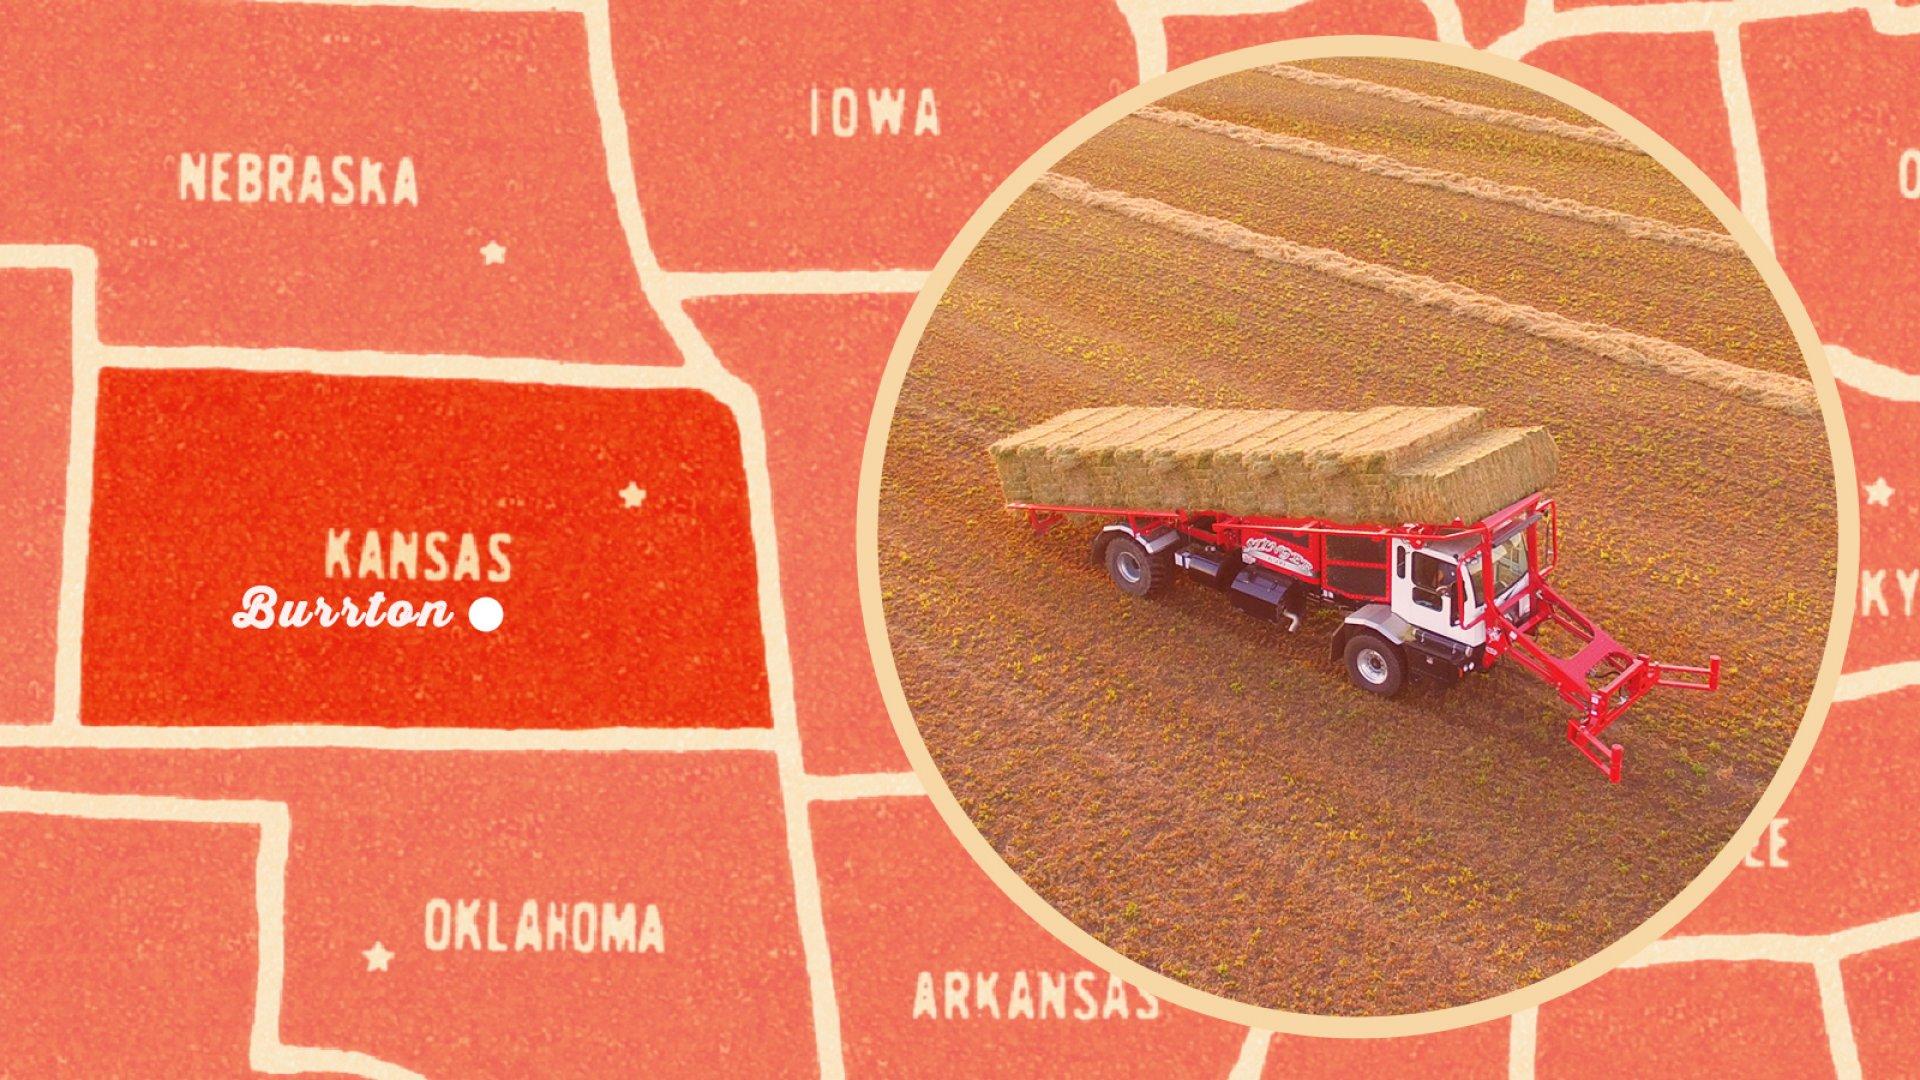 This Kansas Company Has Invented the Lamborghini of Farming Machines